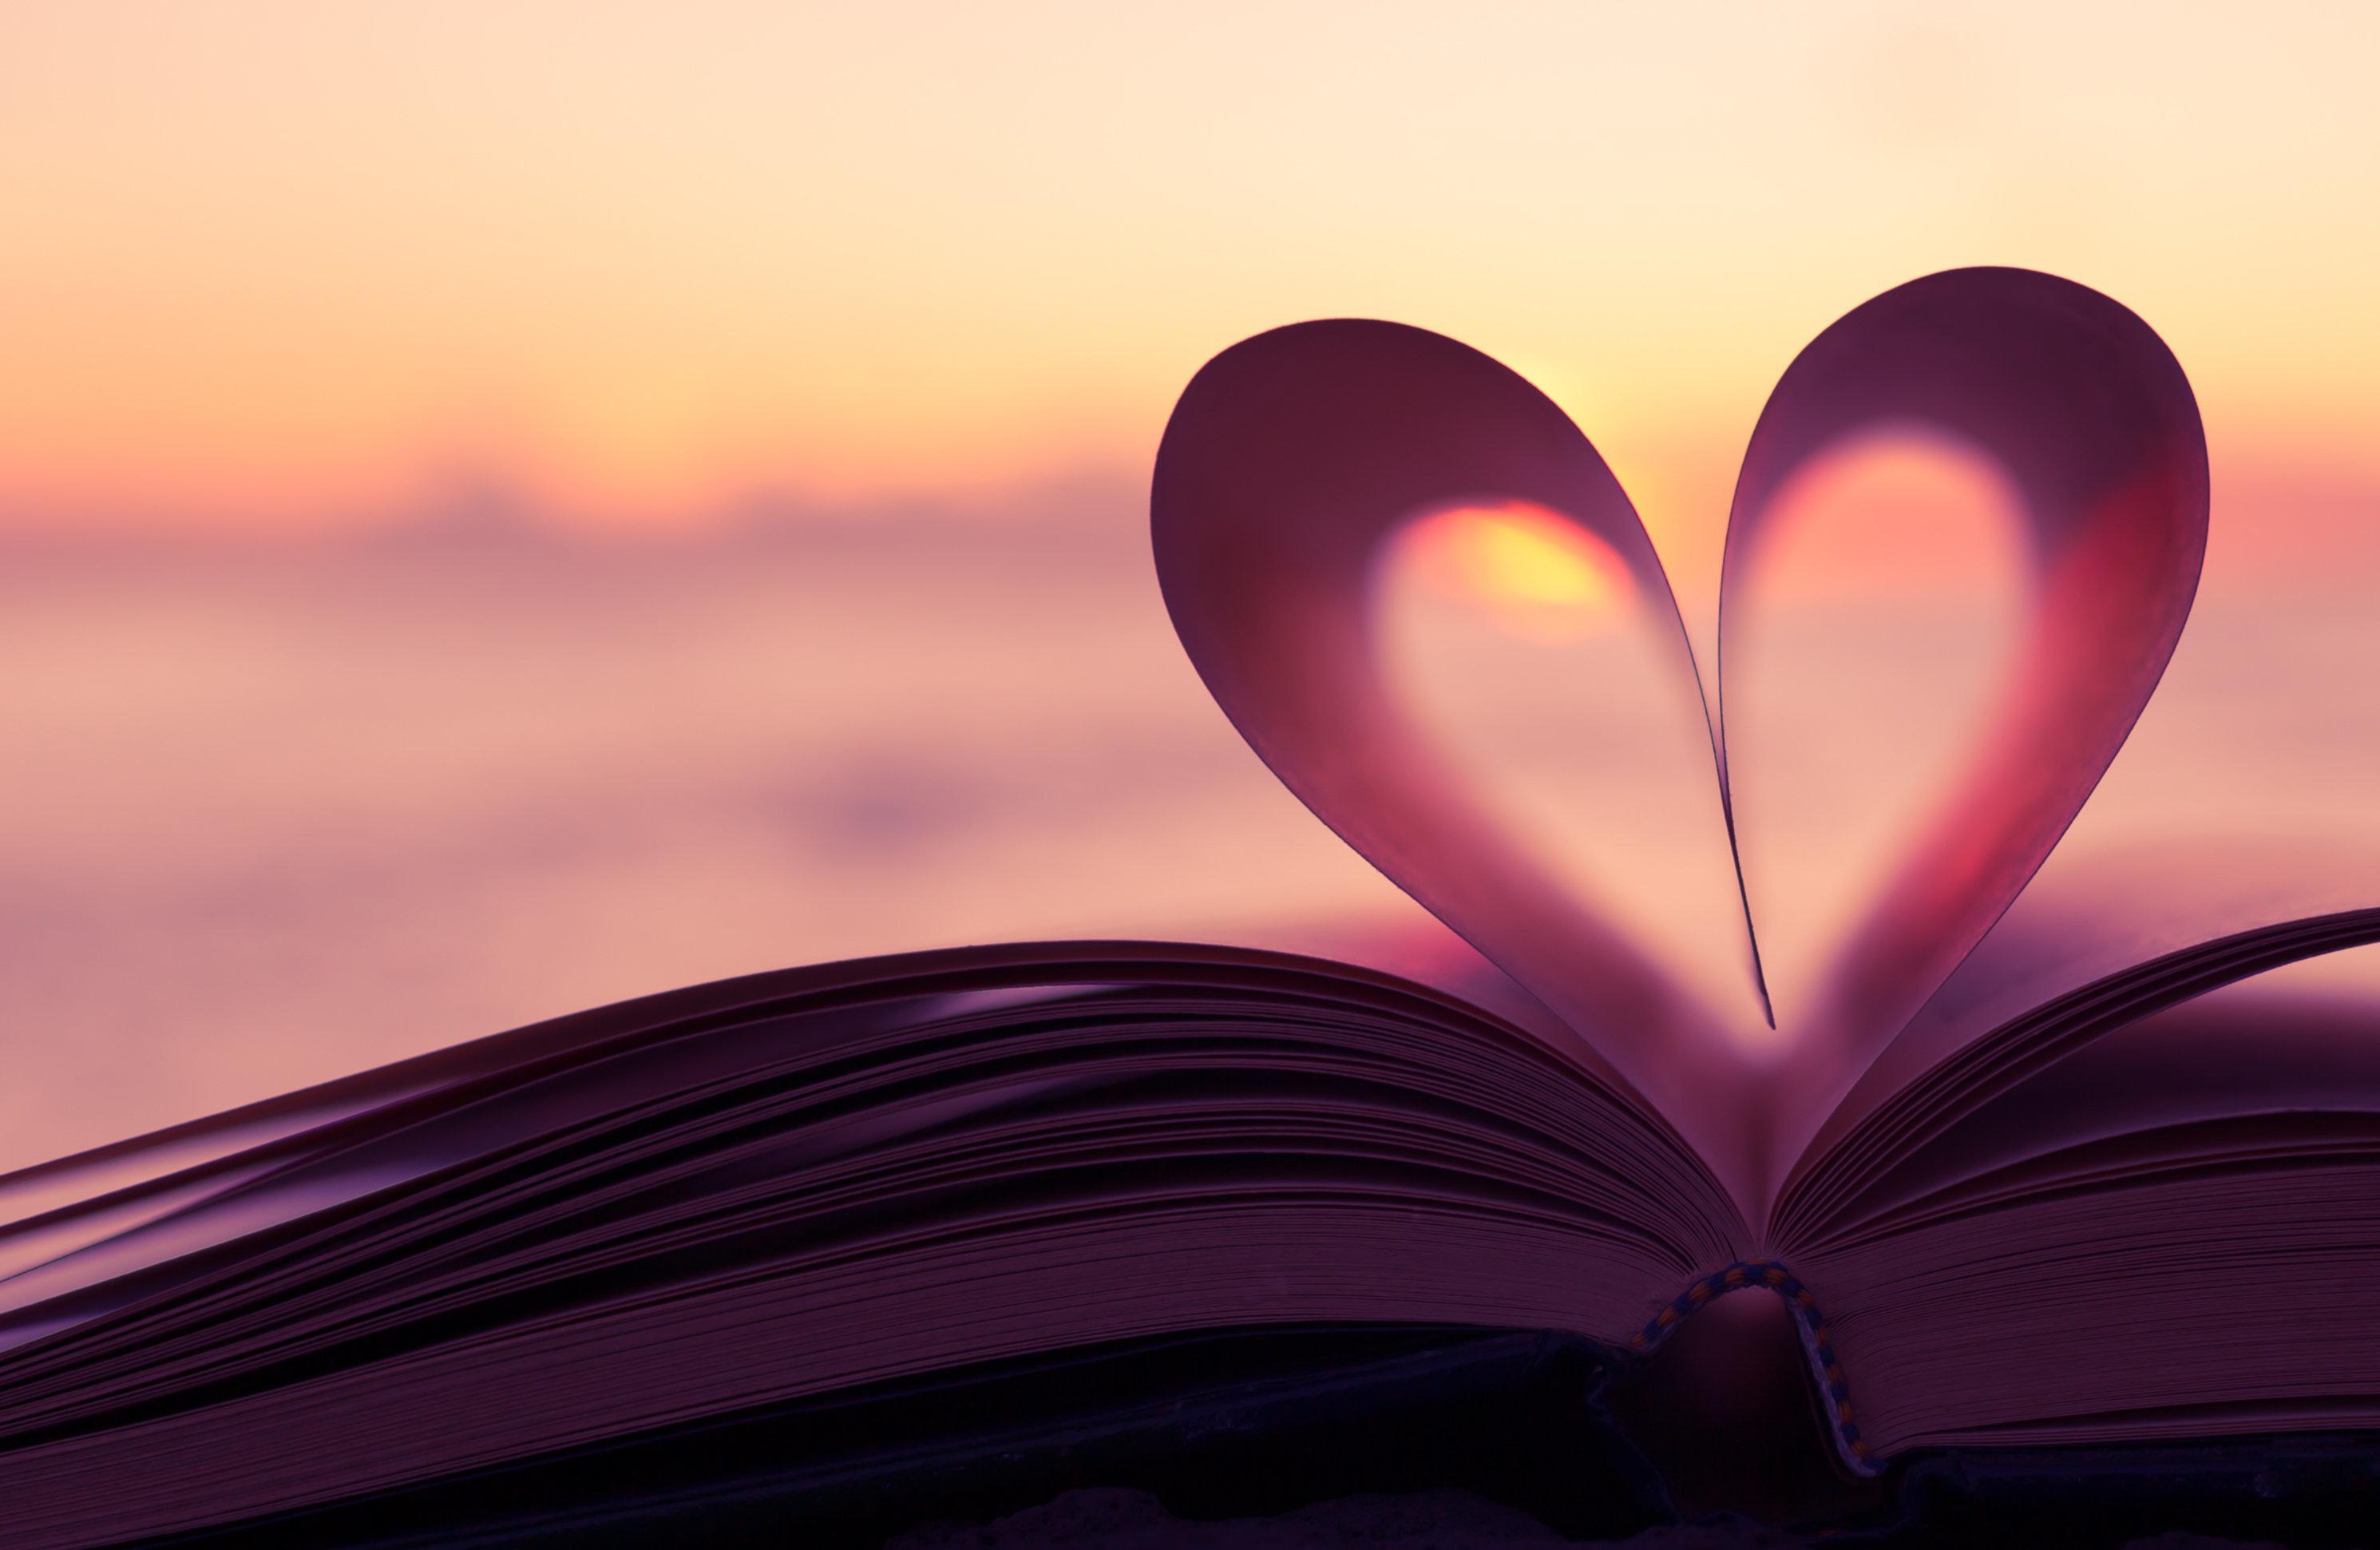 Love2read2gether για γυναίκες και άνδρες, φίλους ή